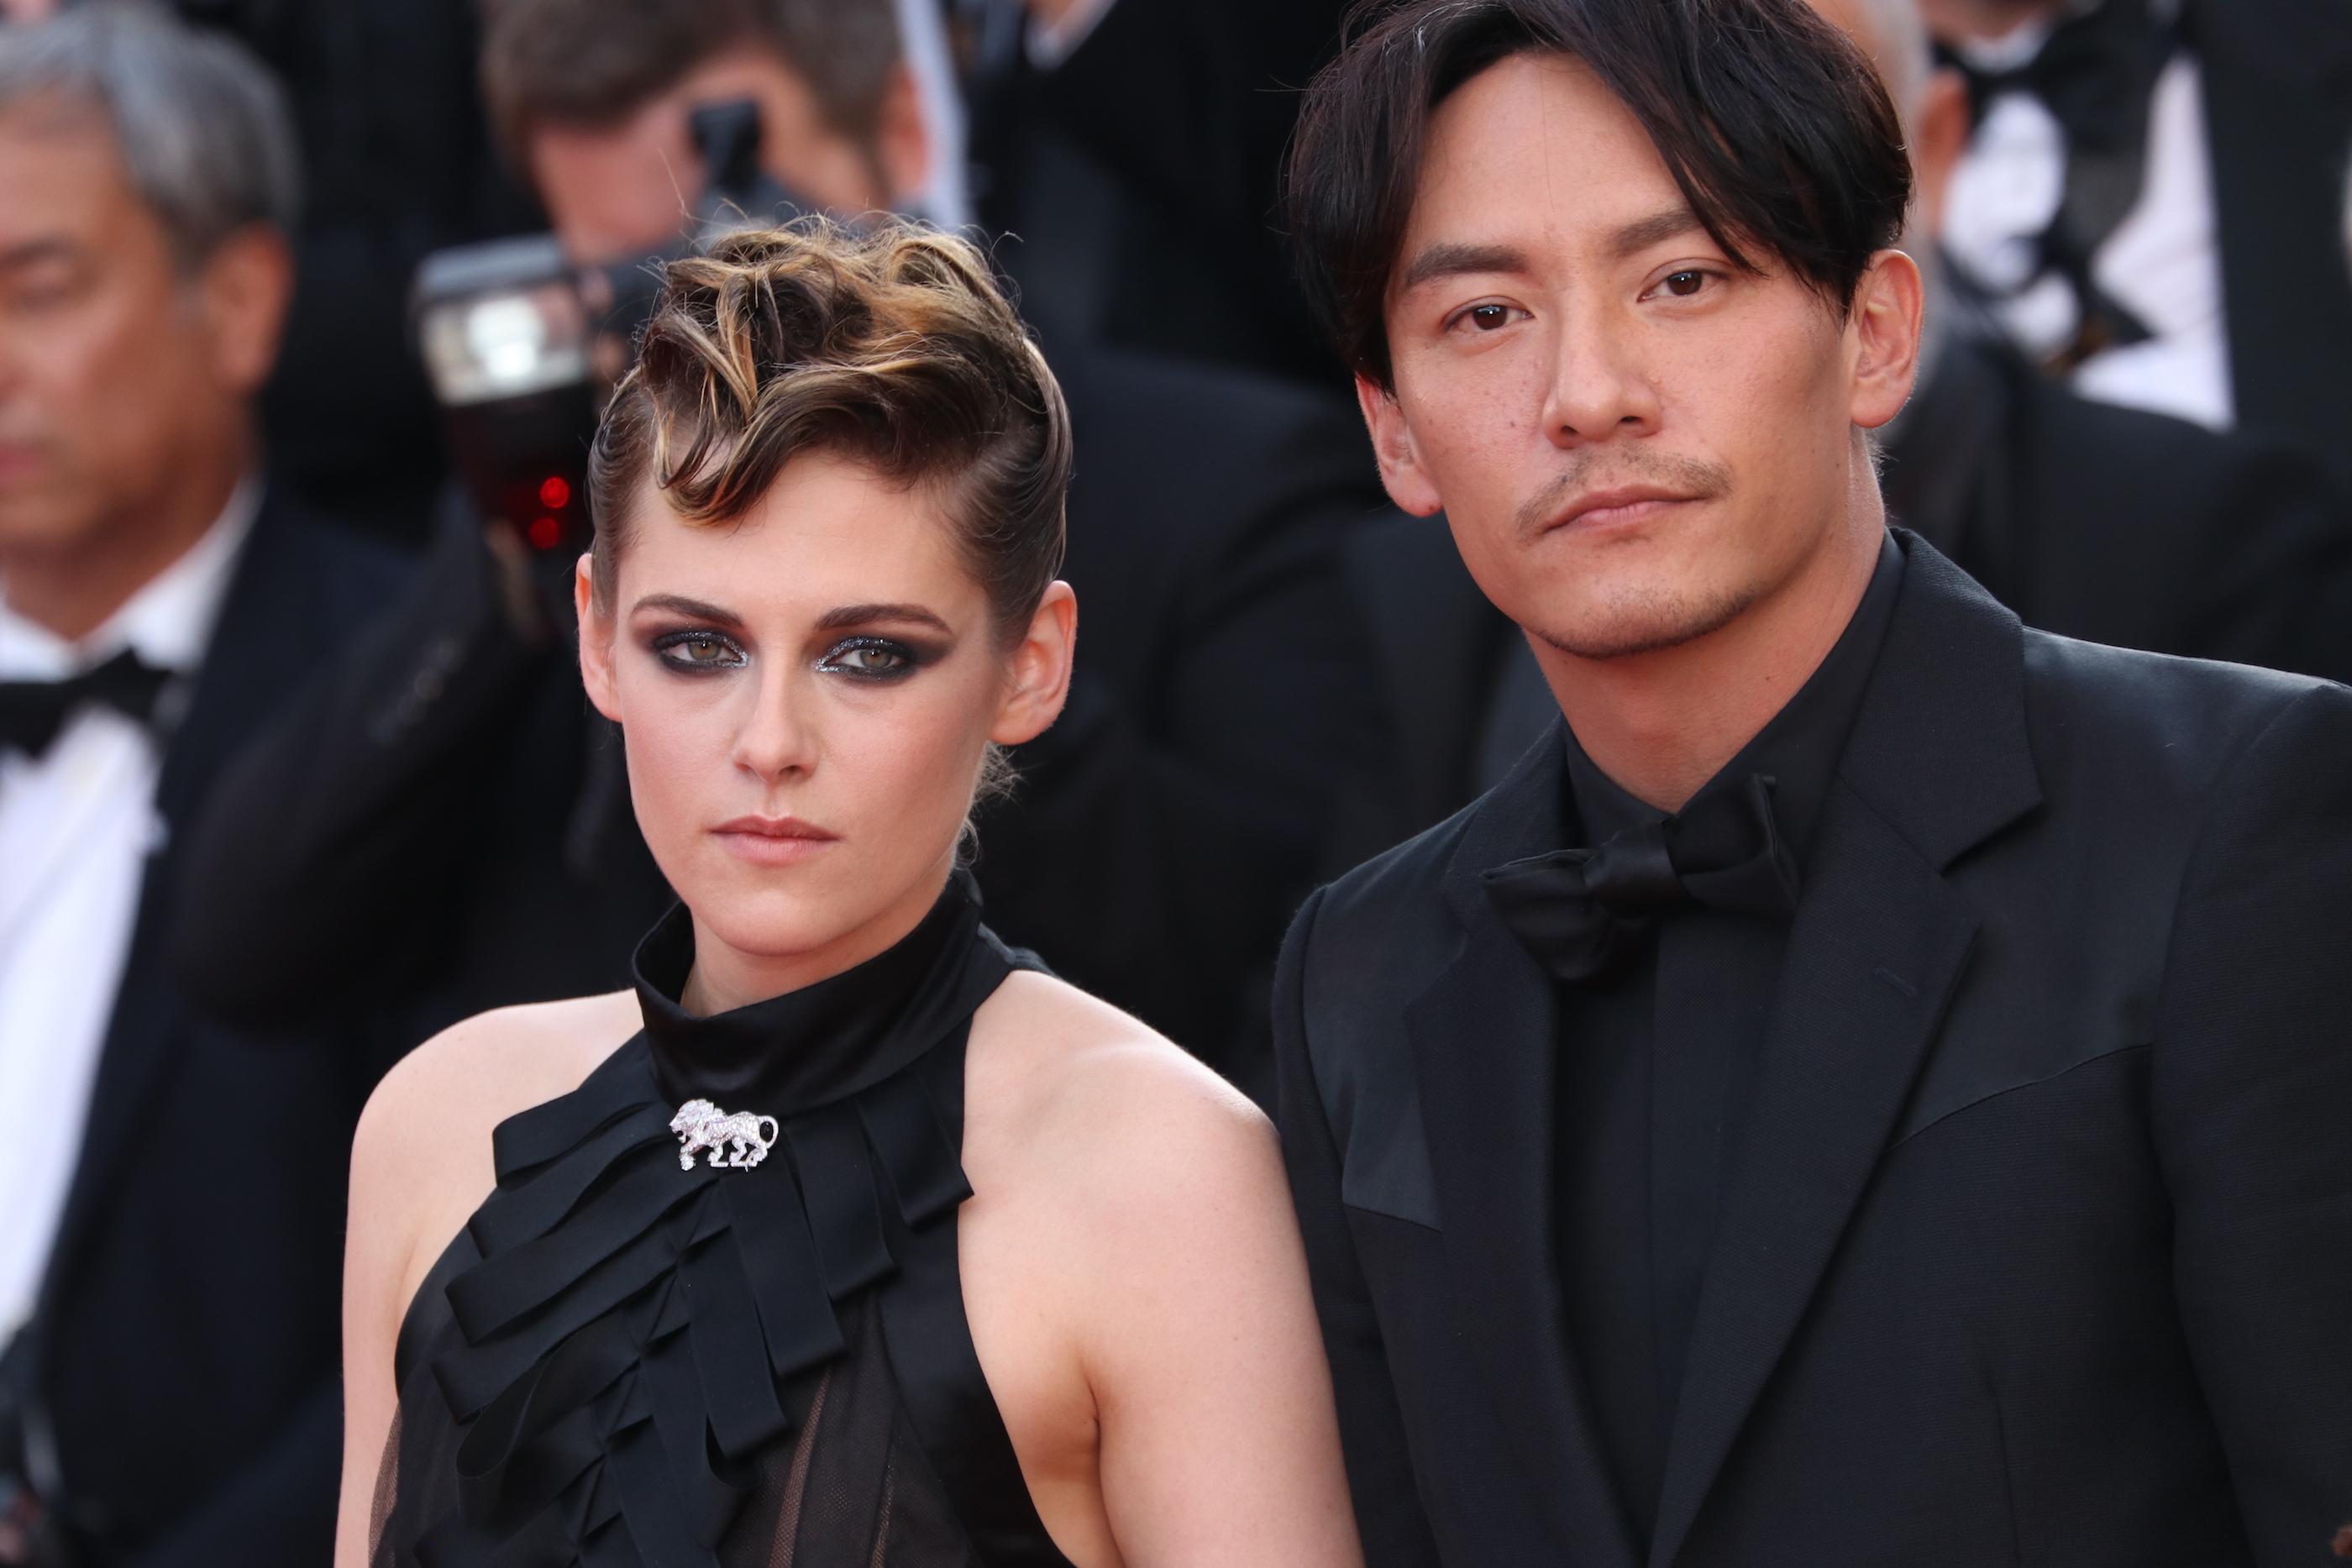 Cannes 2018: Chang Chen e Kristen Stewart sul red carpet di apertura